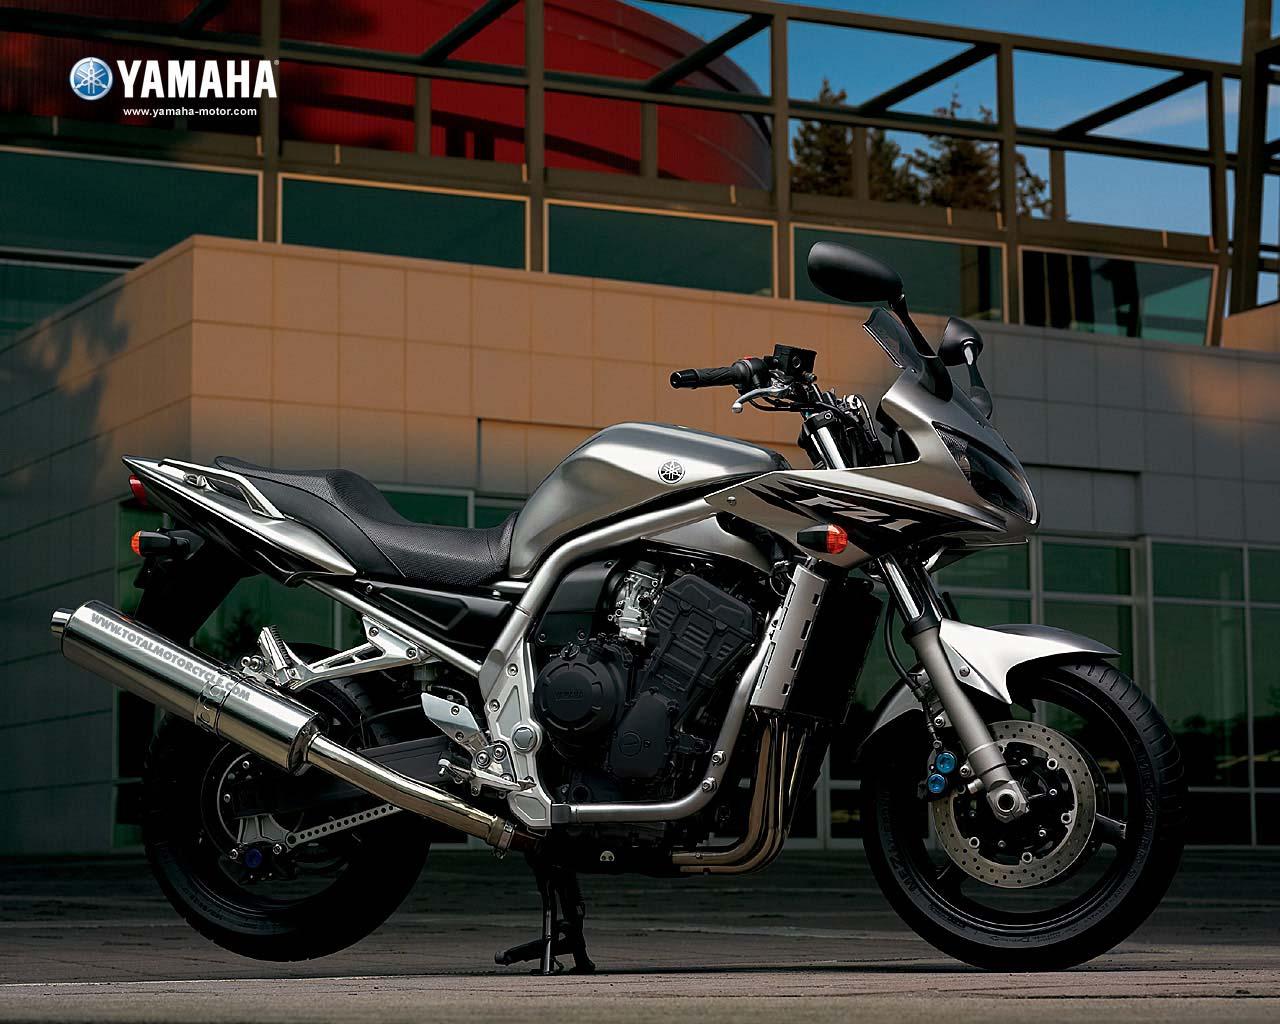 Yamaha FZ Fazer FZ1 (2006-2015) • For Sale • Price Guide • The Bike Market